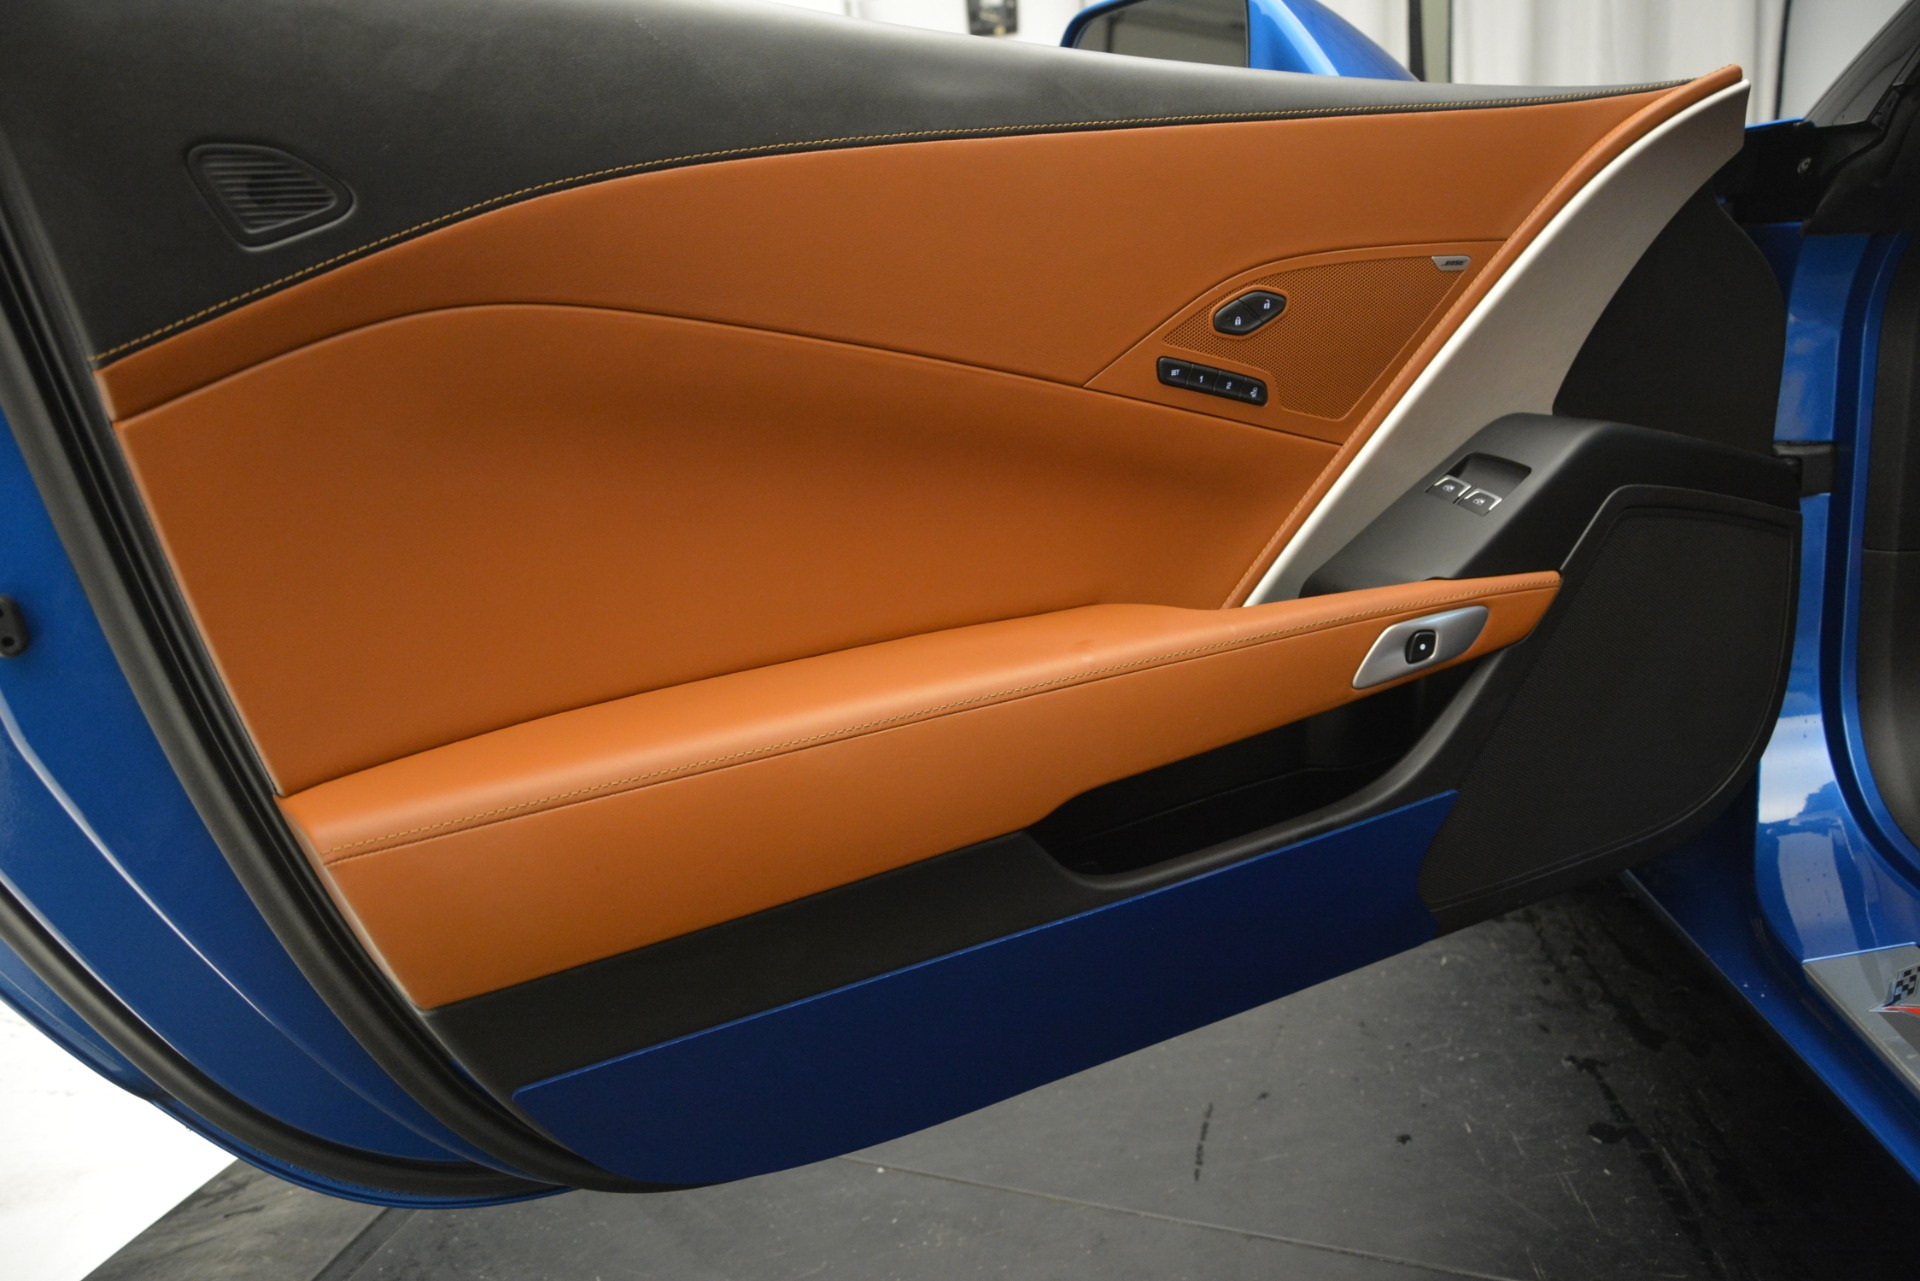 Used 2014 Chevrolet Corvette Stingray Z51 For Sale In Greenwich, CT 2703_p17